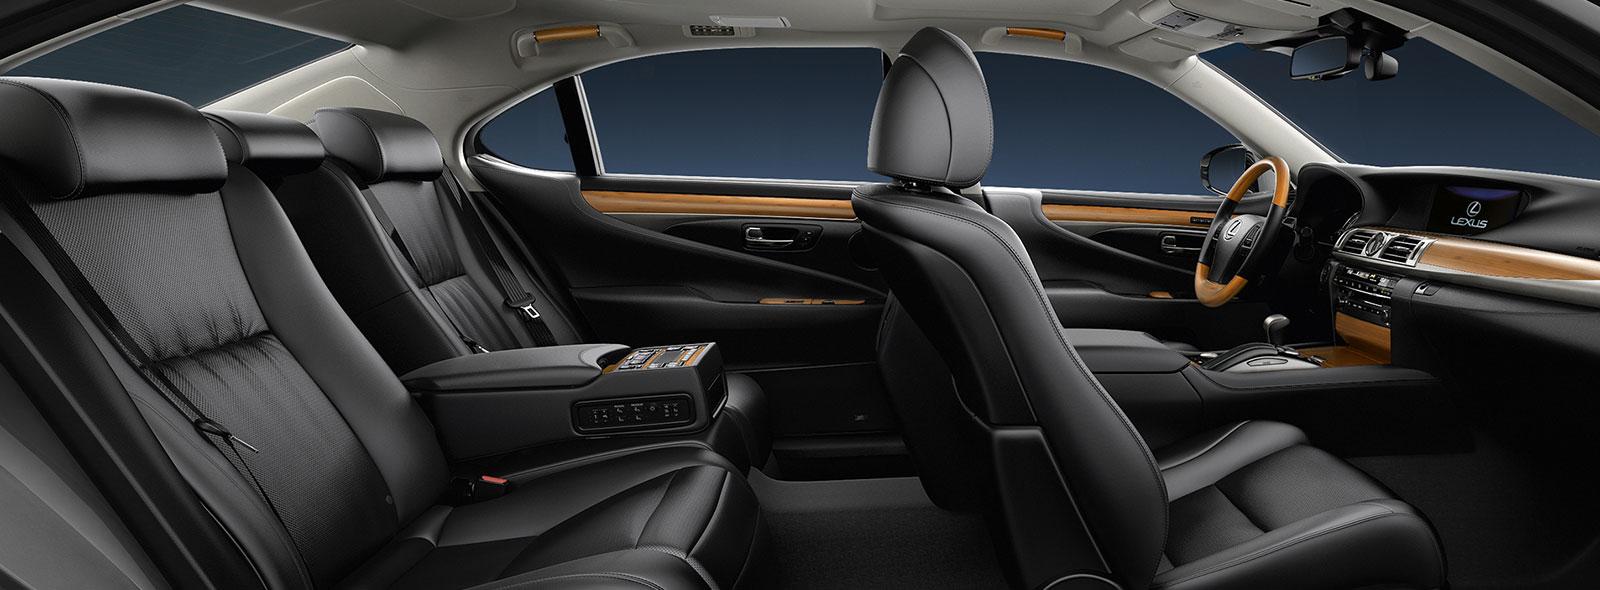 Vista interior de asientos de piel negra del Lexus LS 600h L